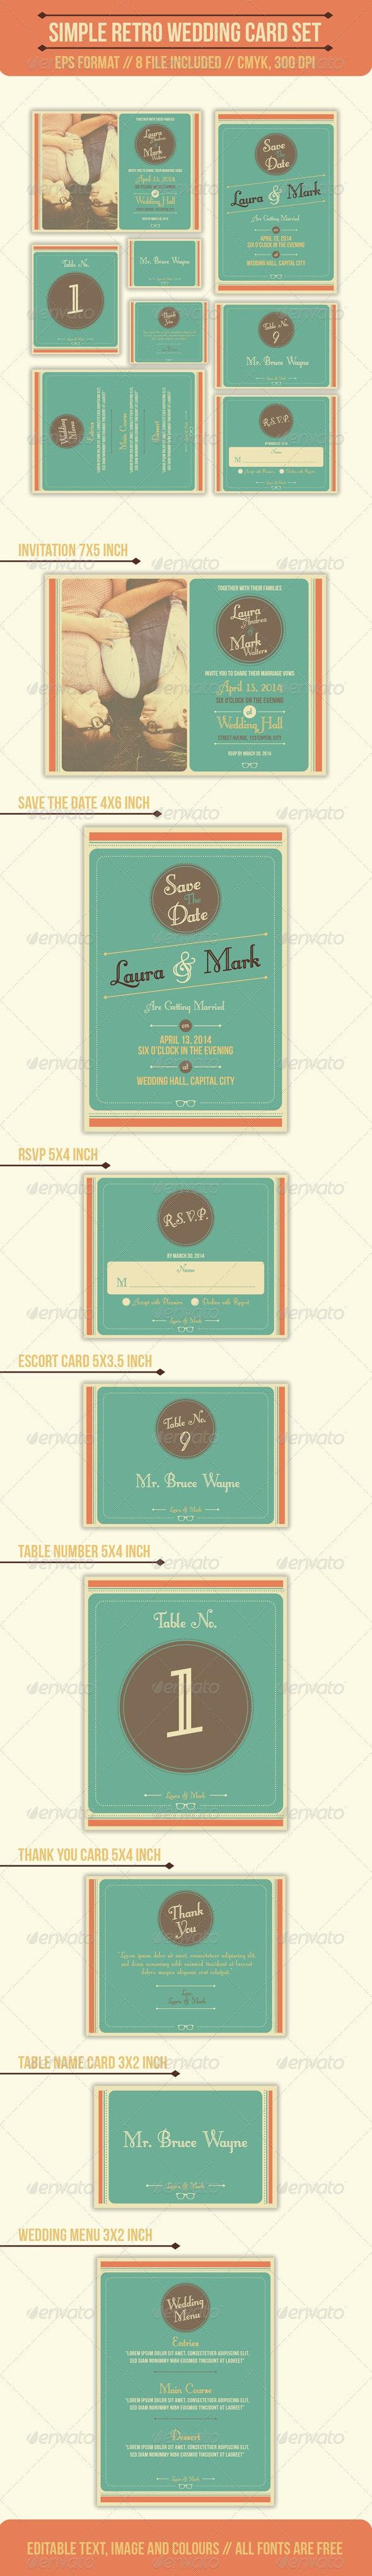 Simple Retro Wedding Card Set - Weddings Cards & Invites